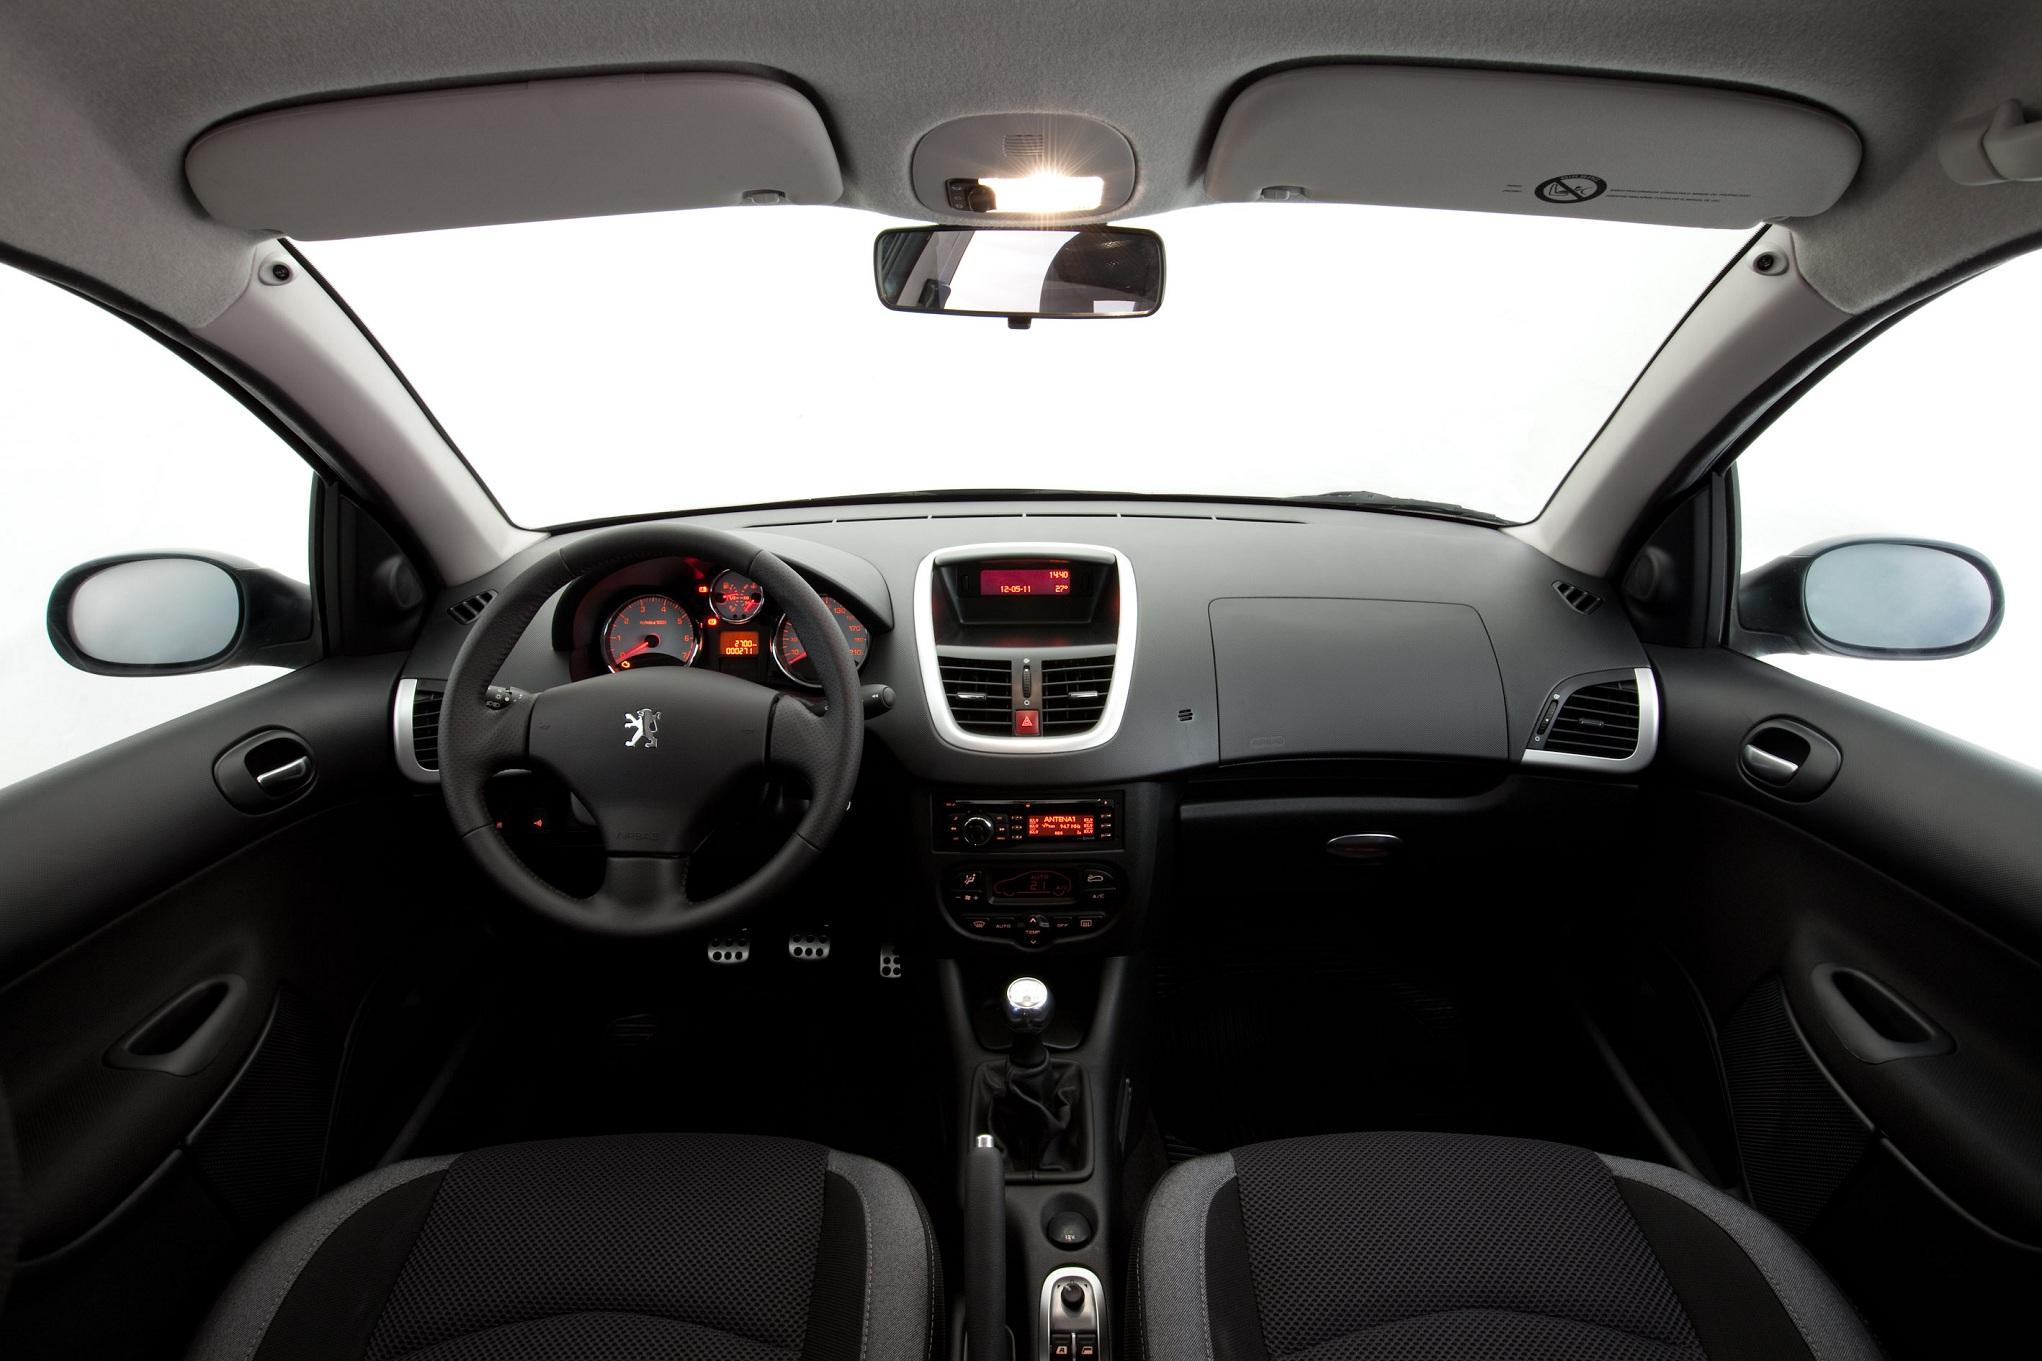 Peugeot 207 Chega 224 Linha 2012 Com Leves Retoques All